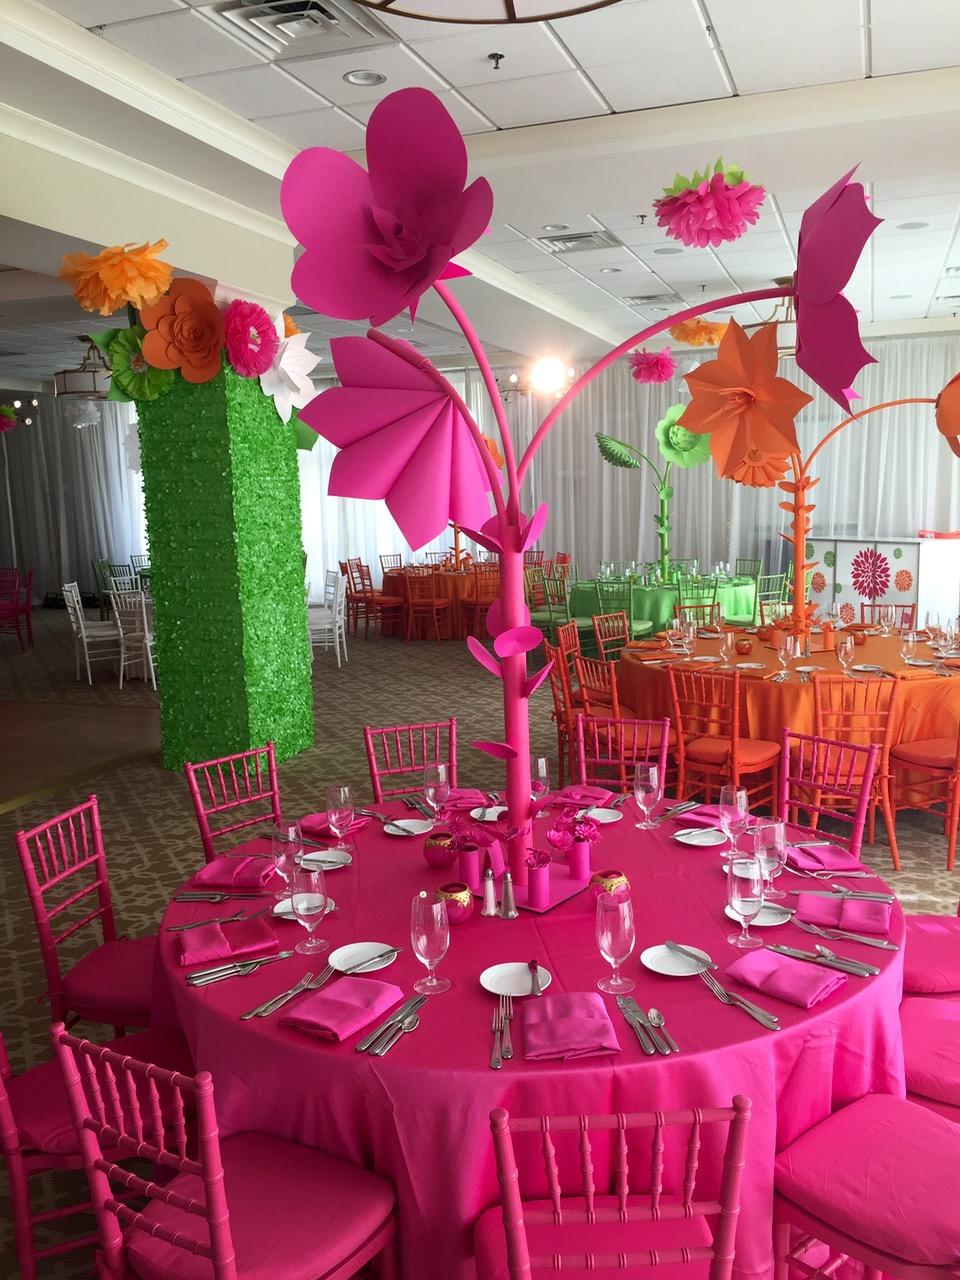 Paper Flower Centerpiece Pink Orange Green Color Scheme Bat Mitzvah Decor Crestmont Country Club - Eggsotic Events NJ NYC Event Design Custom Decor  - 1.jpg